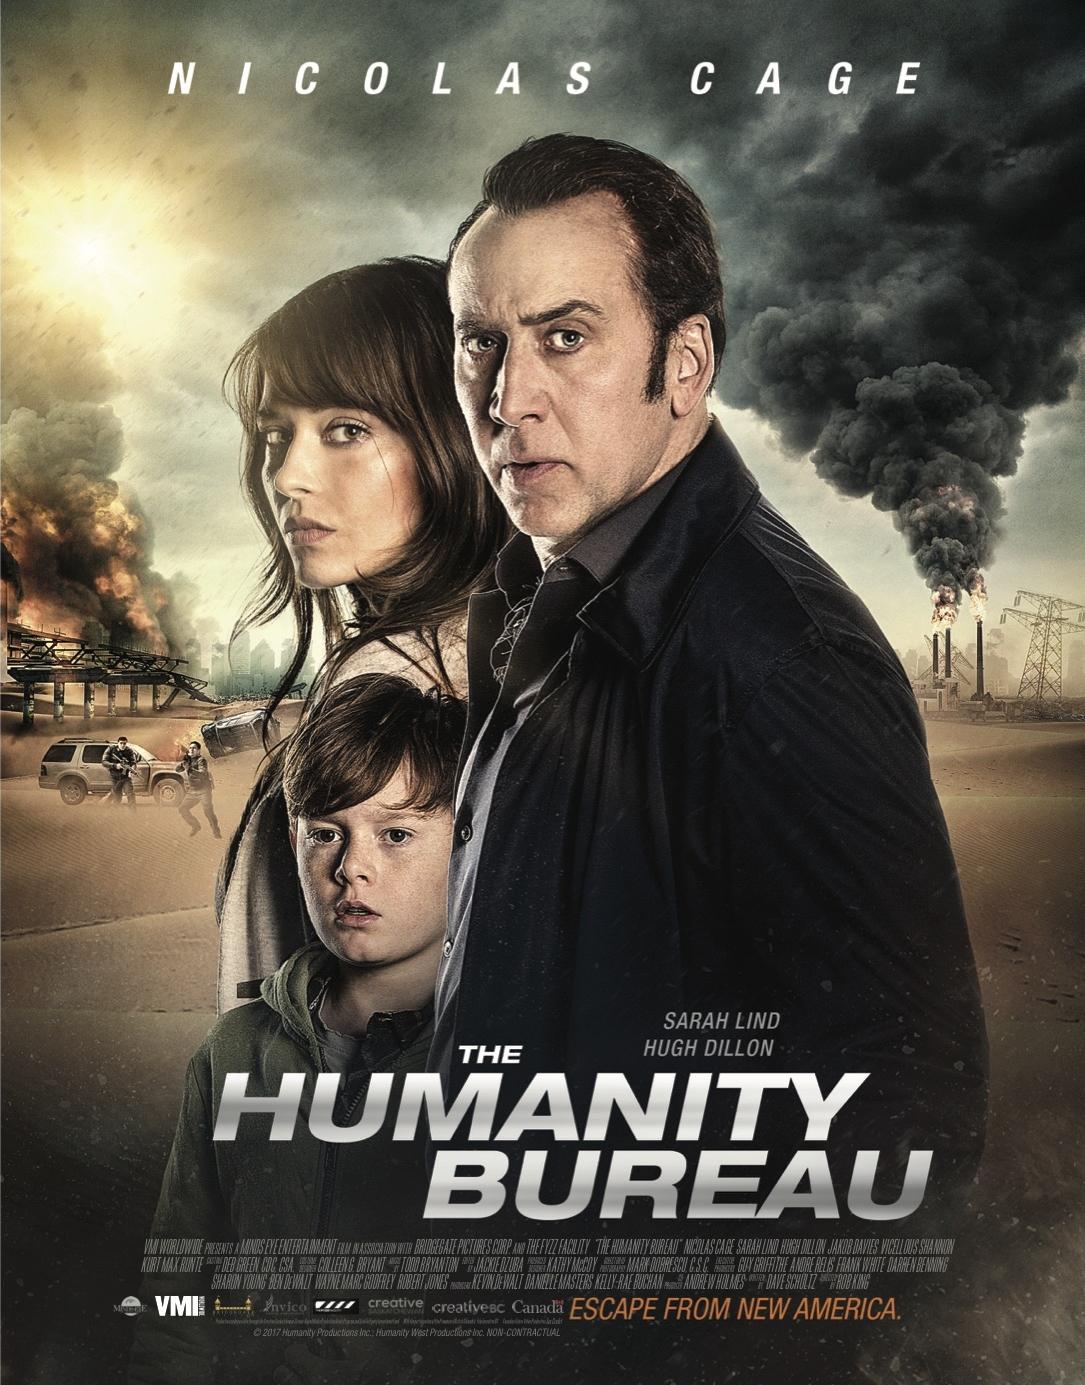 the humanity bureau movie starring nicolas cage teaser